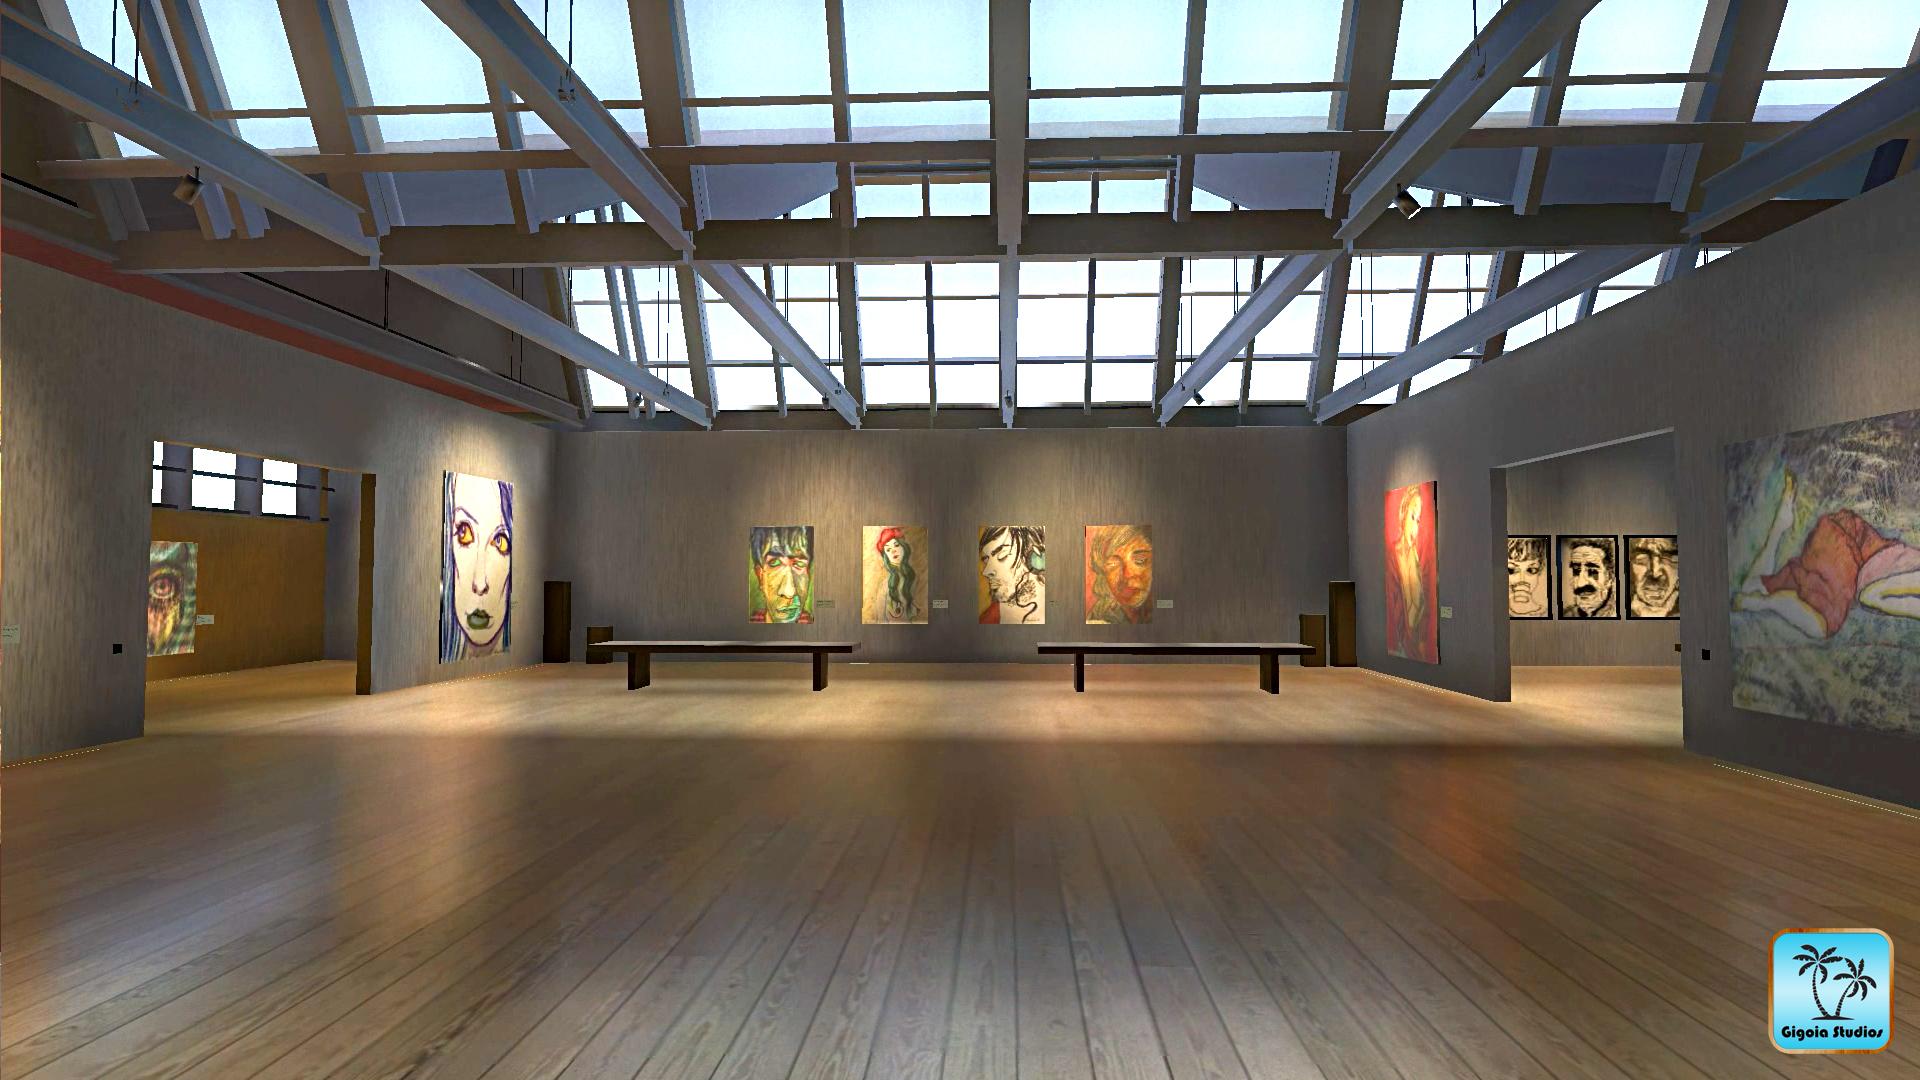 New York City Events April 2018 Calendar NYC Activities 3d virtual art gallery app